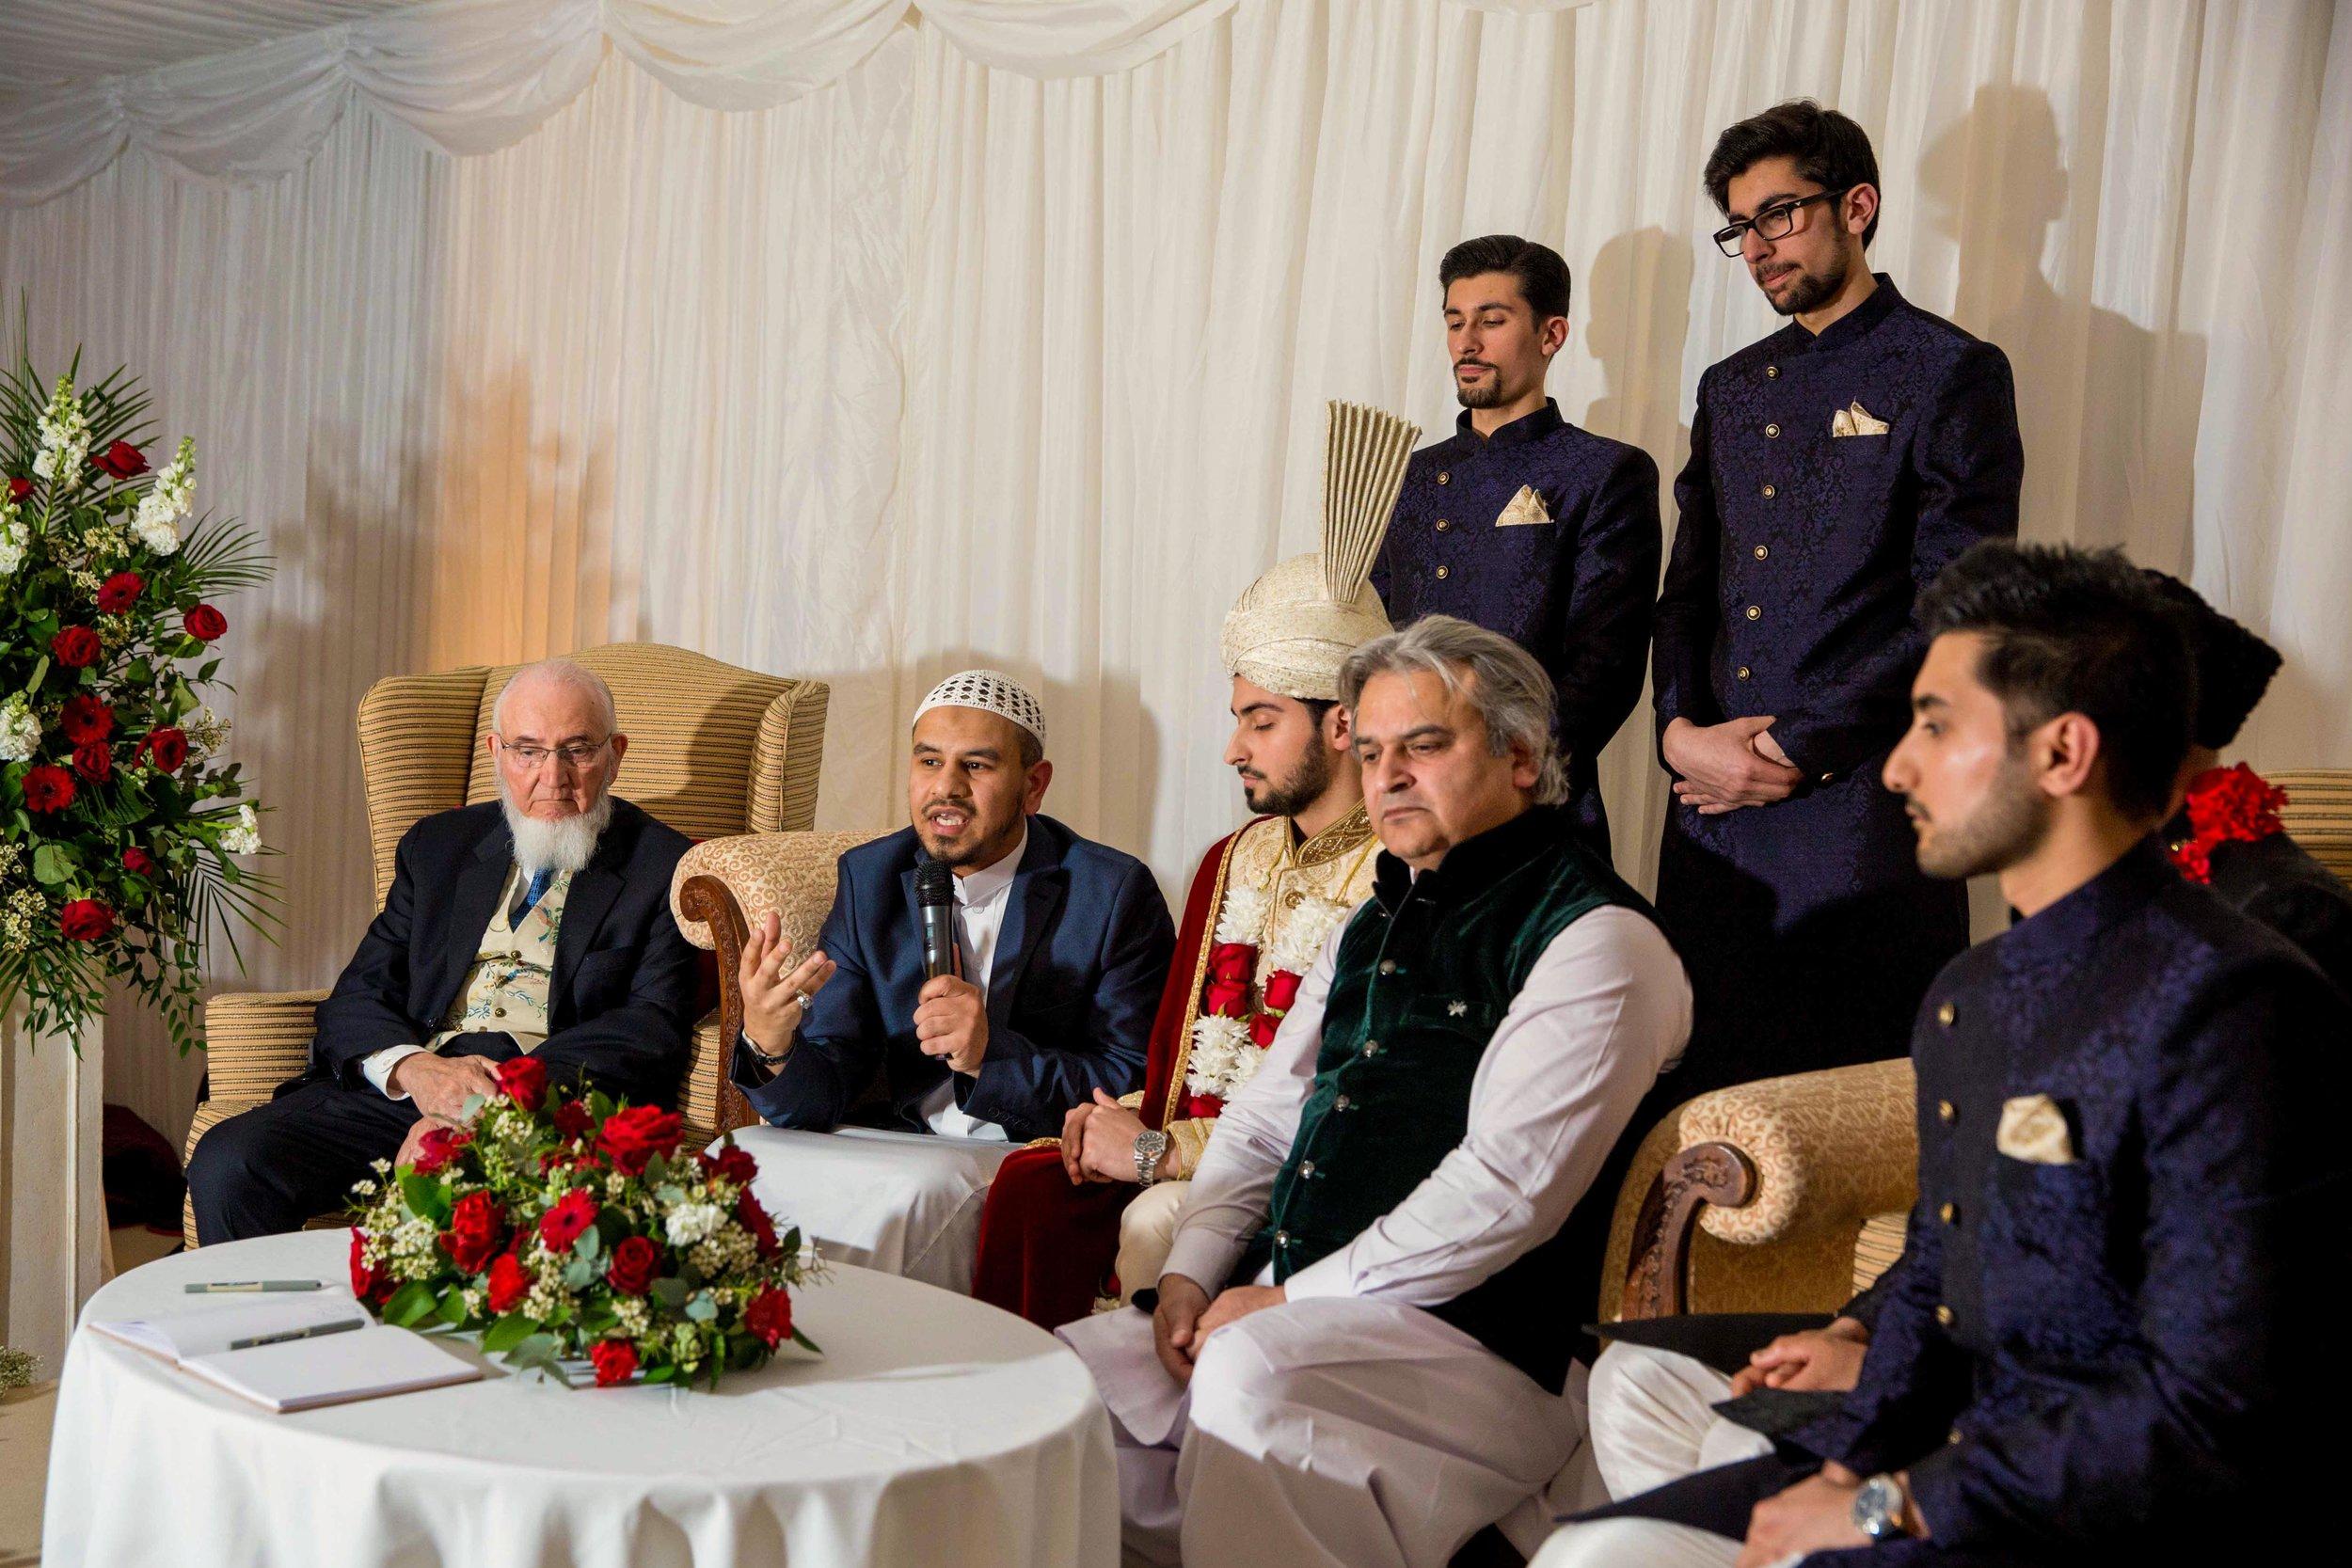 Macdonald-Berystede-Hotel-wedding-female-asian-wedding-photographer-london-natalia-smith-photography-56-2.jpg